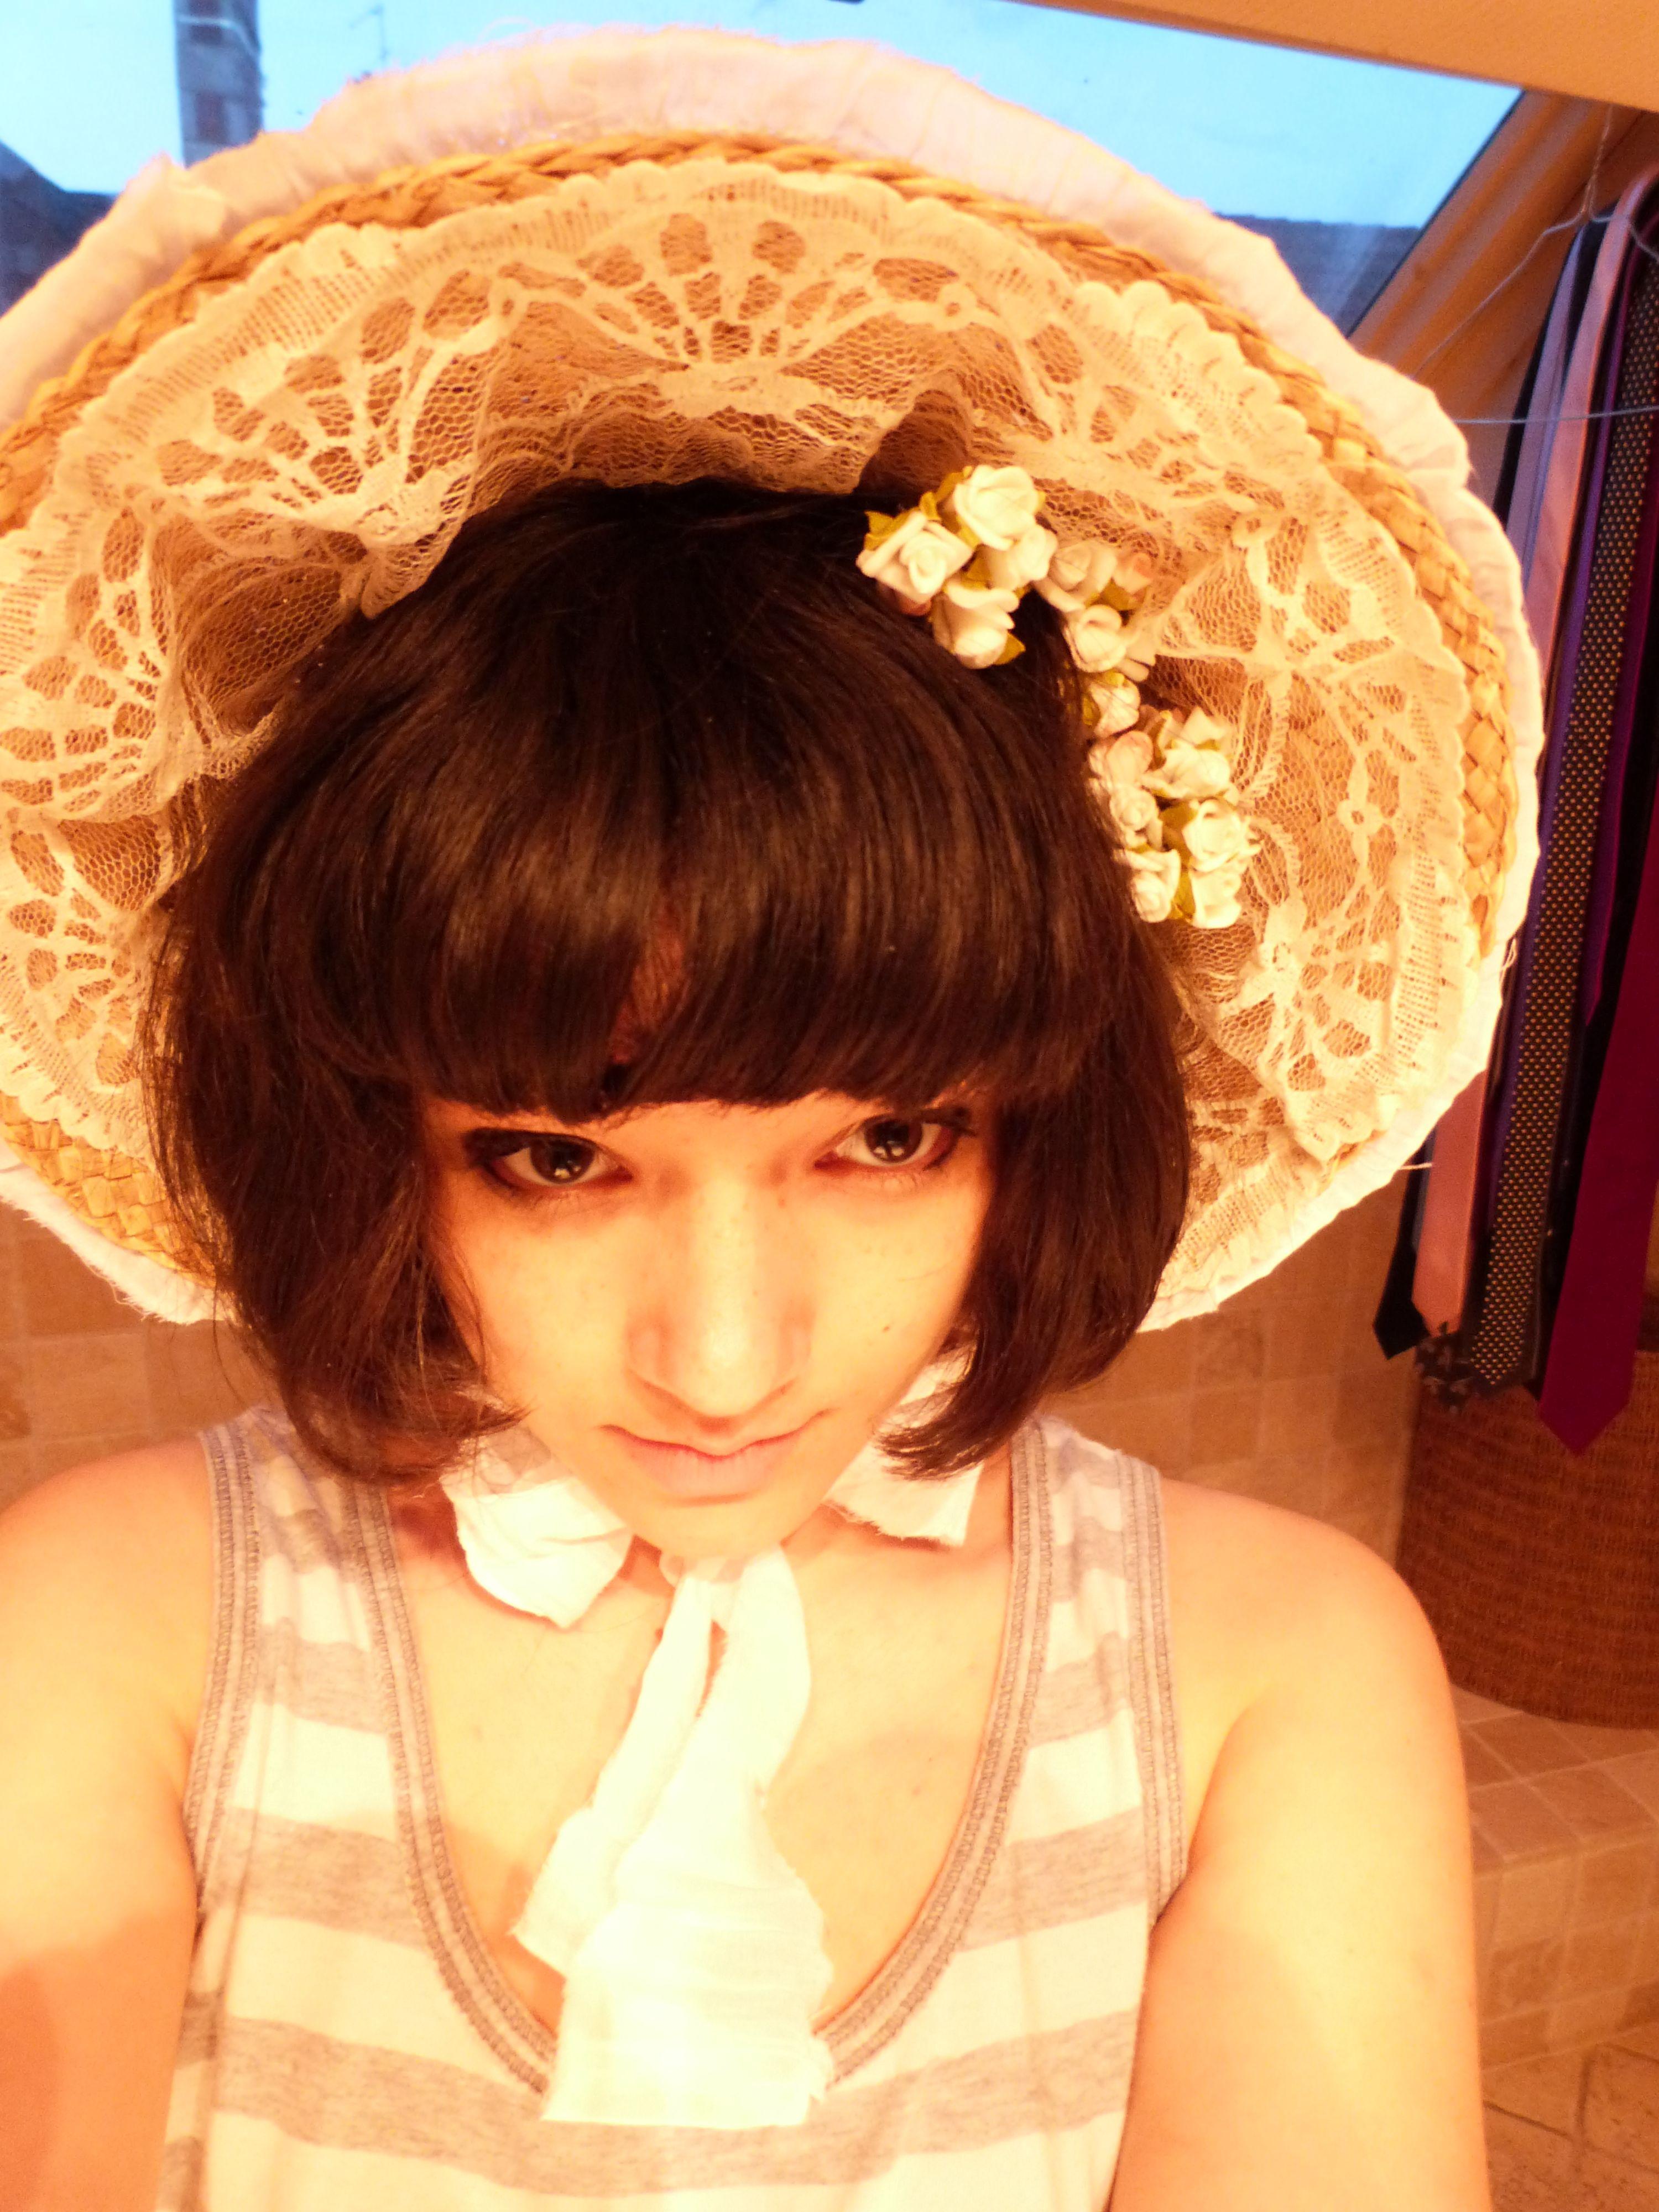 Diy lolita bonnet - Halloween perhaps!